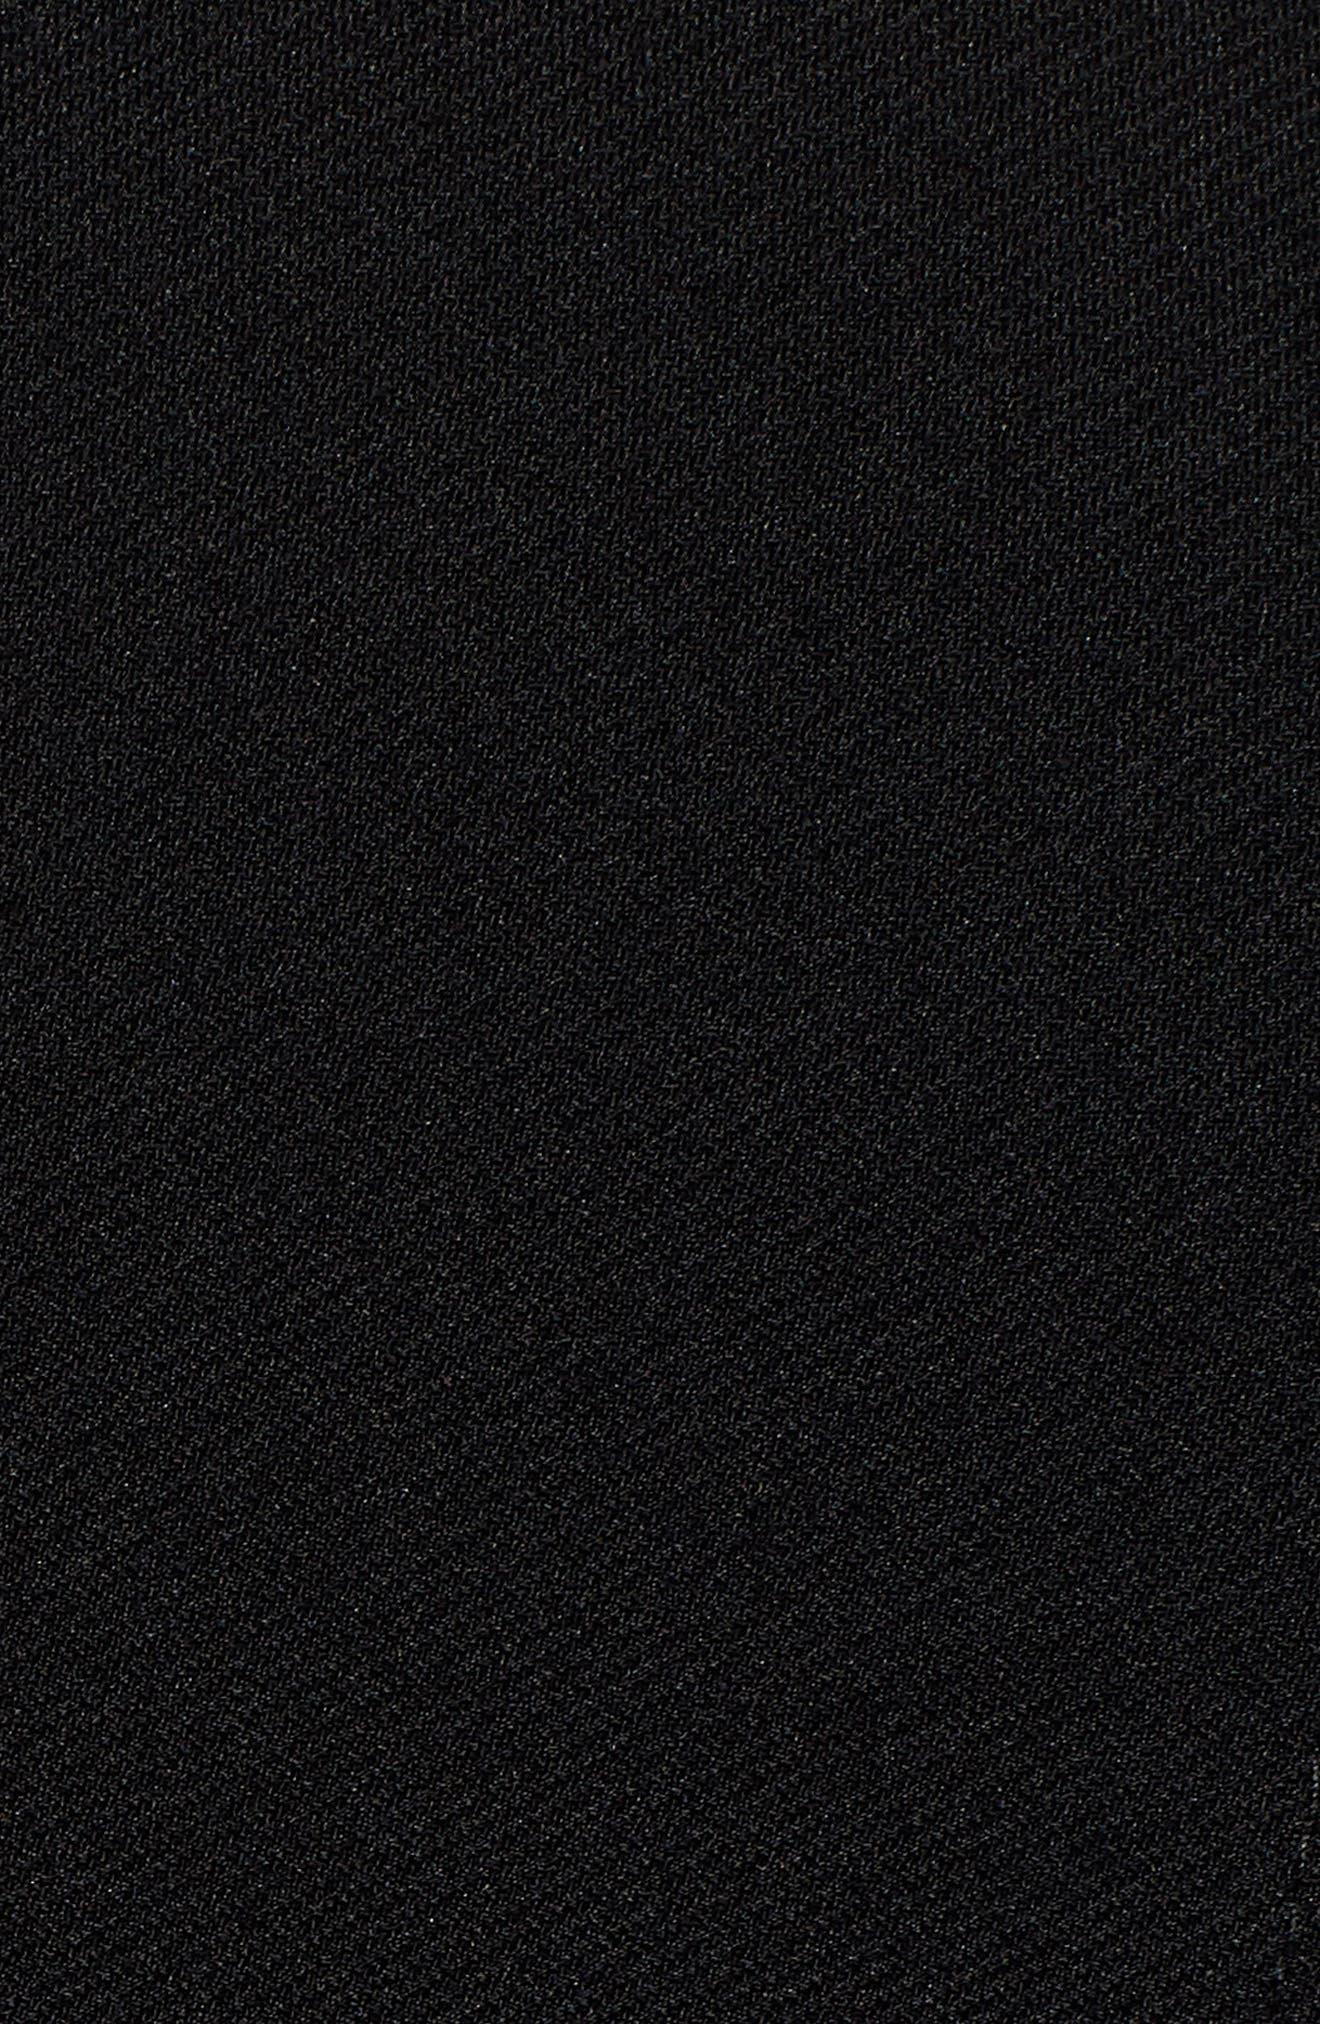 Jazulara Twill Jersey Suit Jacket,                             Alternate thumbnail 6, color,                             001